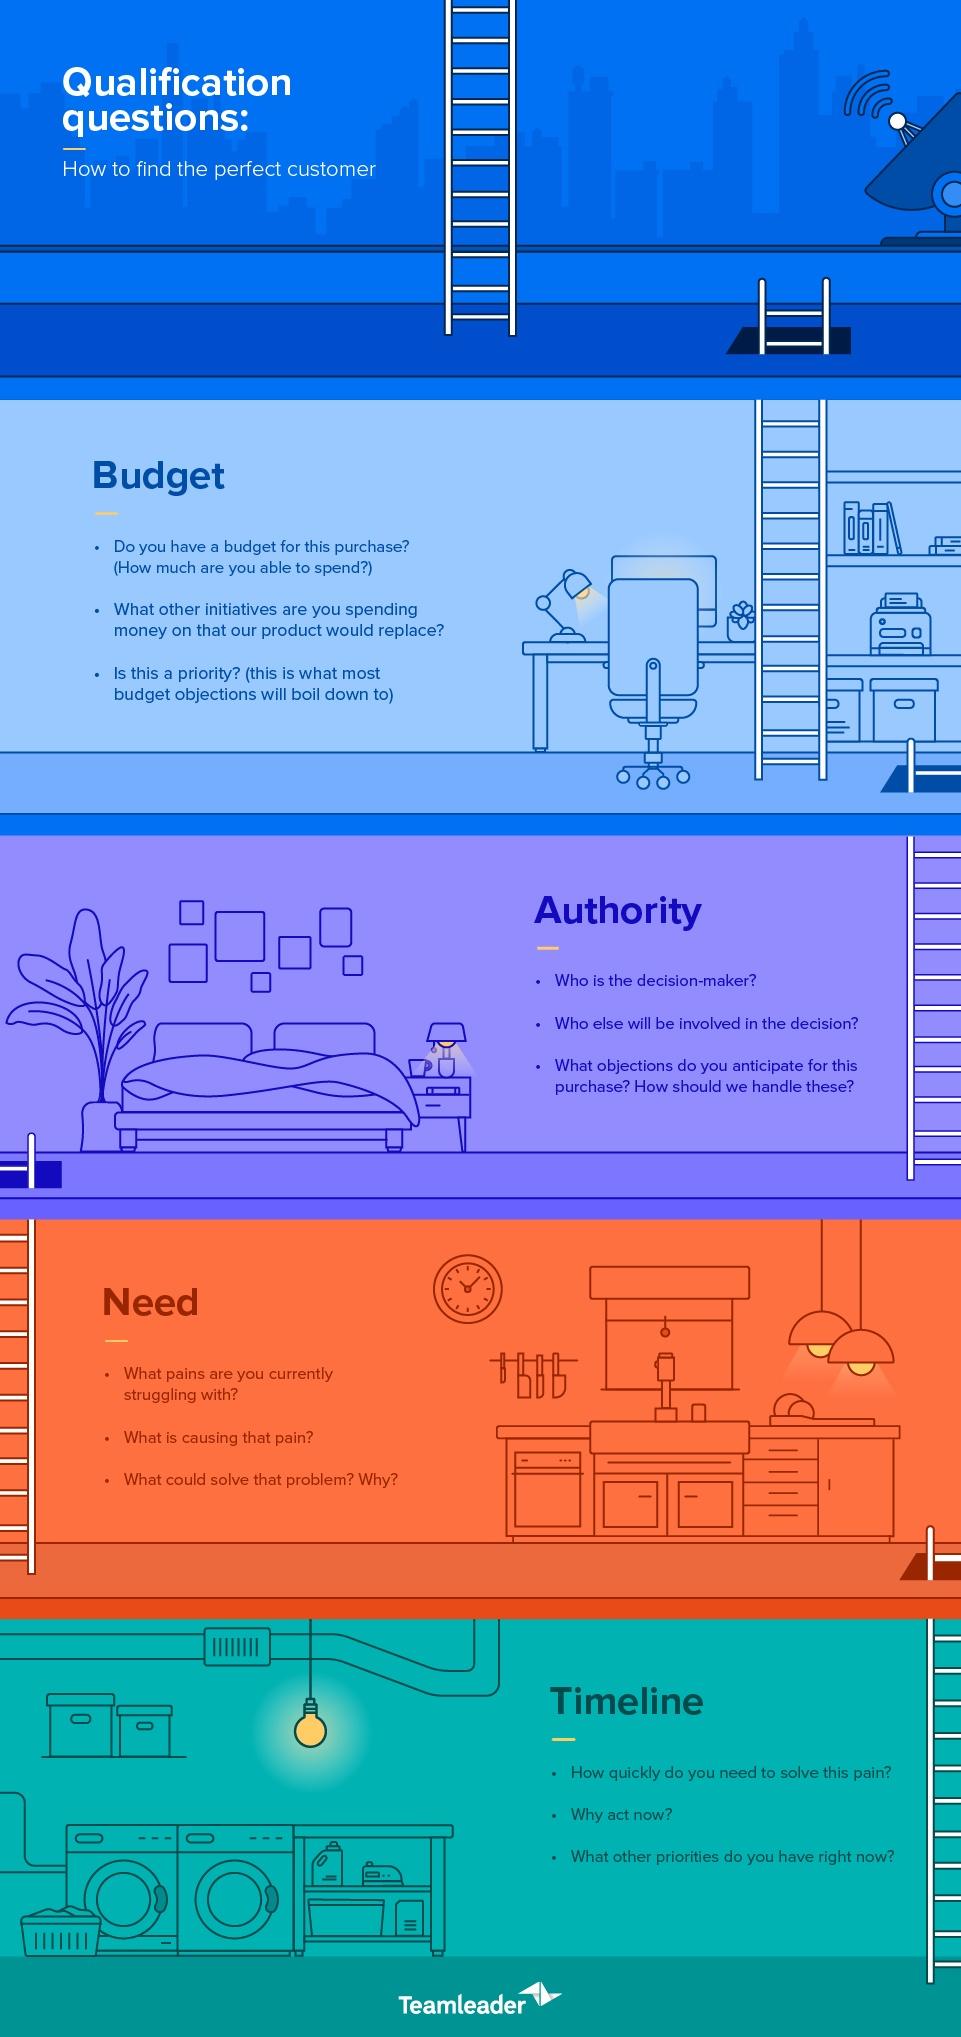 1_Blog3_QualifyLeads_Infographic_2.jpg